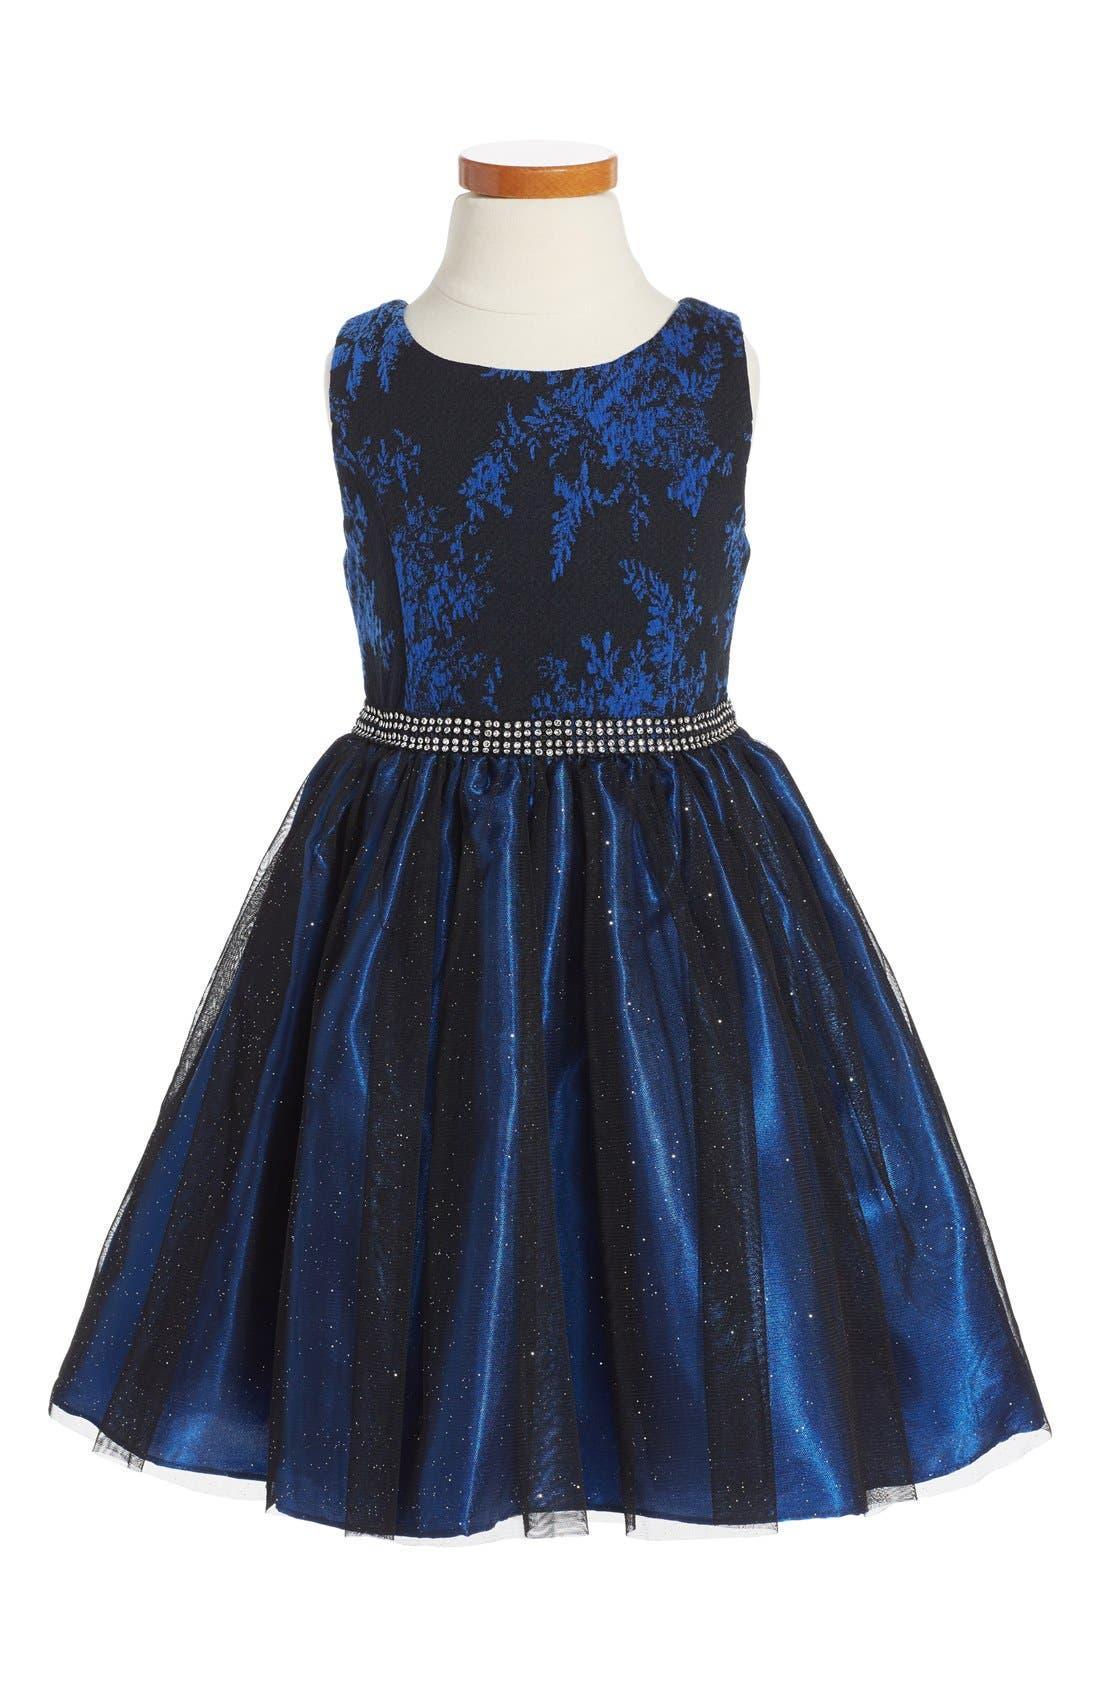 Alternate Image 1 Selected - Sweet Heart Rose Fit & Flare Dress (Toddler Girls, Little Girls & Big Girls)